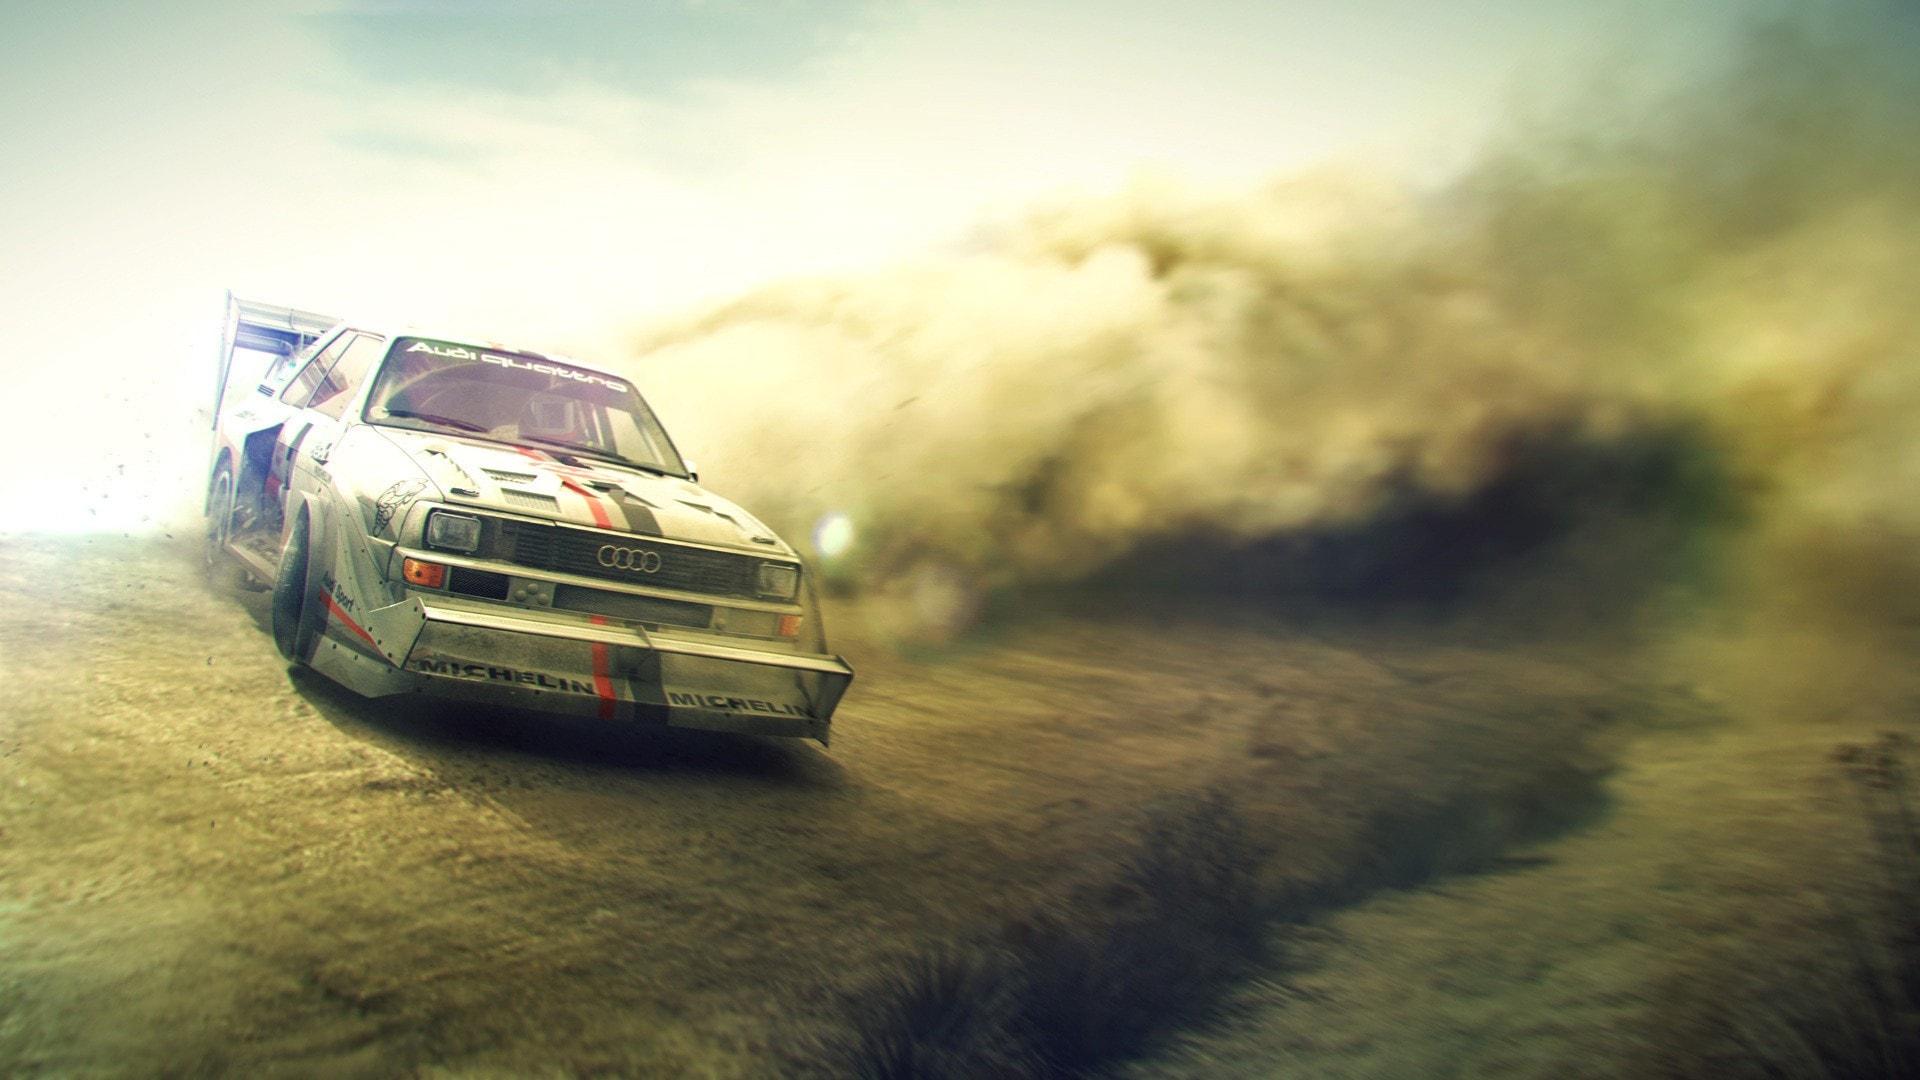 dirt rally hd desktop wallpapers | 7wallpapers